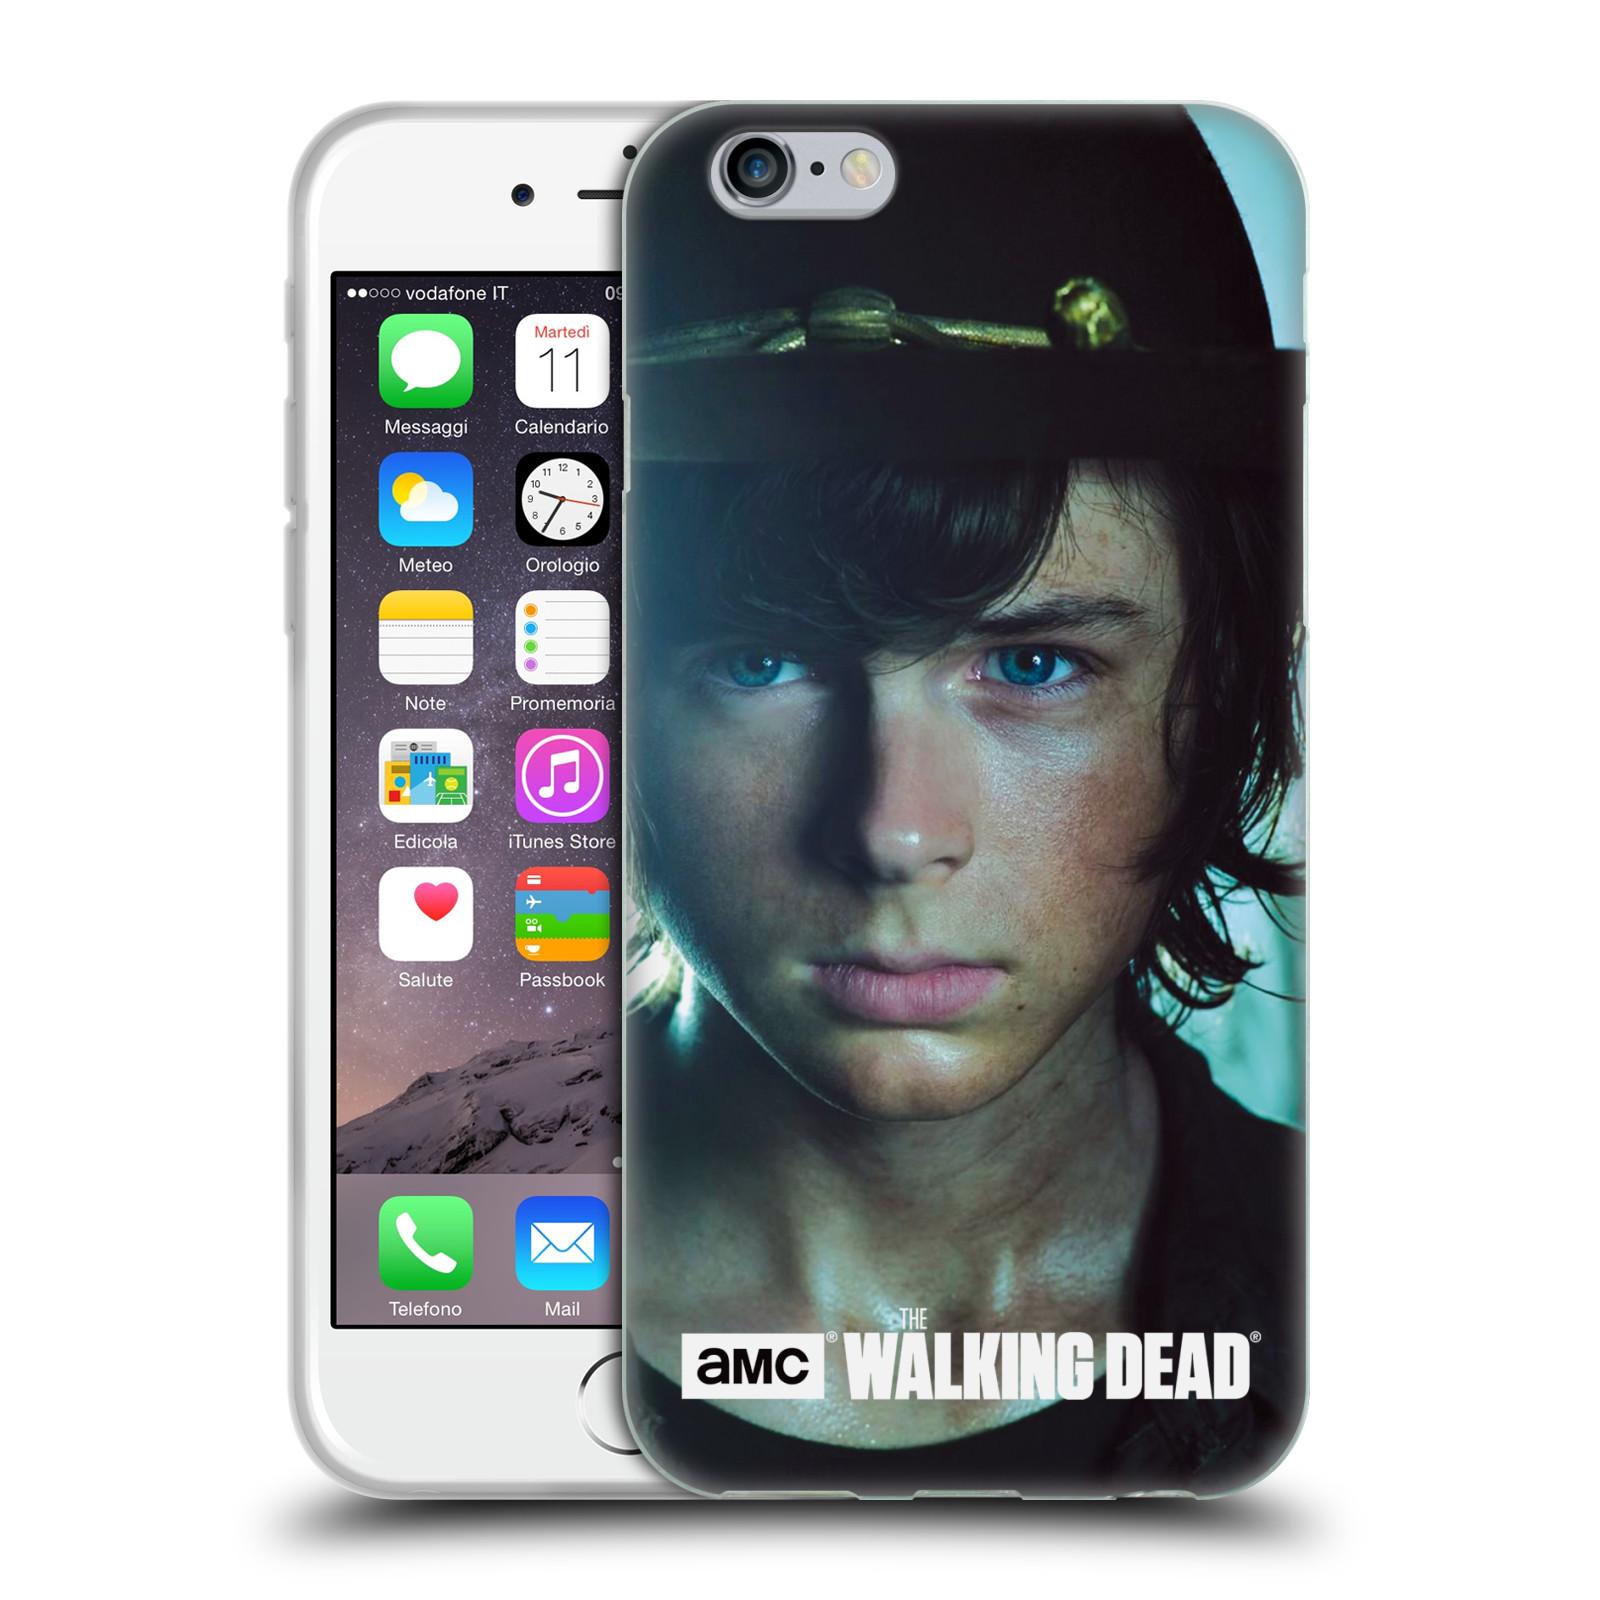 HEAD CASE silikonový obal na mobil Apple Iphone 6 / 6S originální potisk Walking Dead postavy Carl